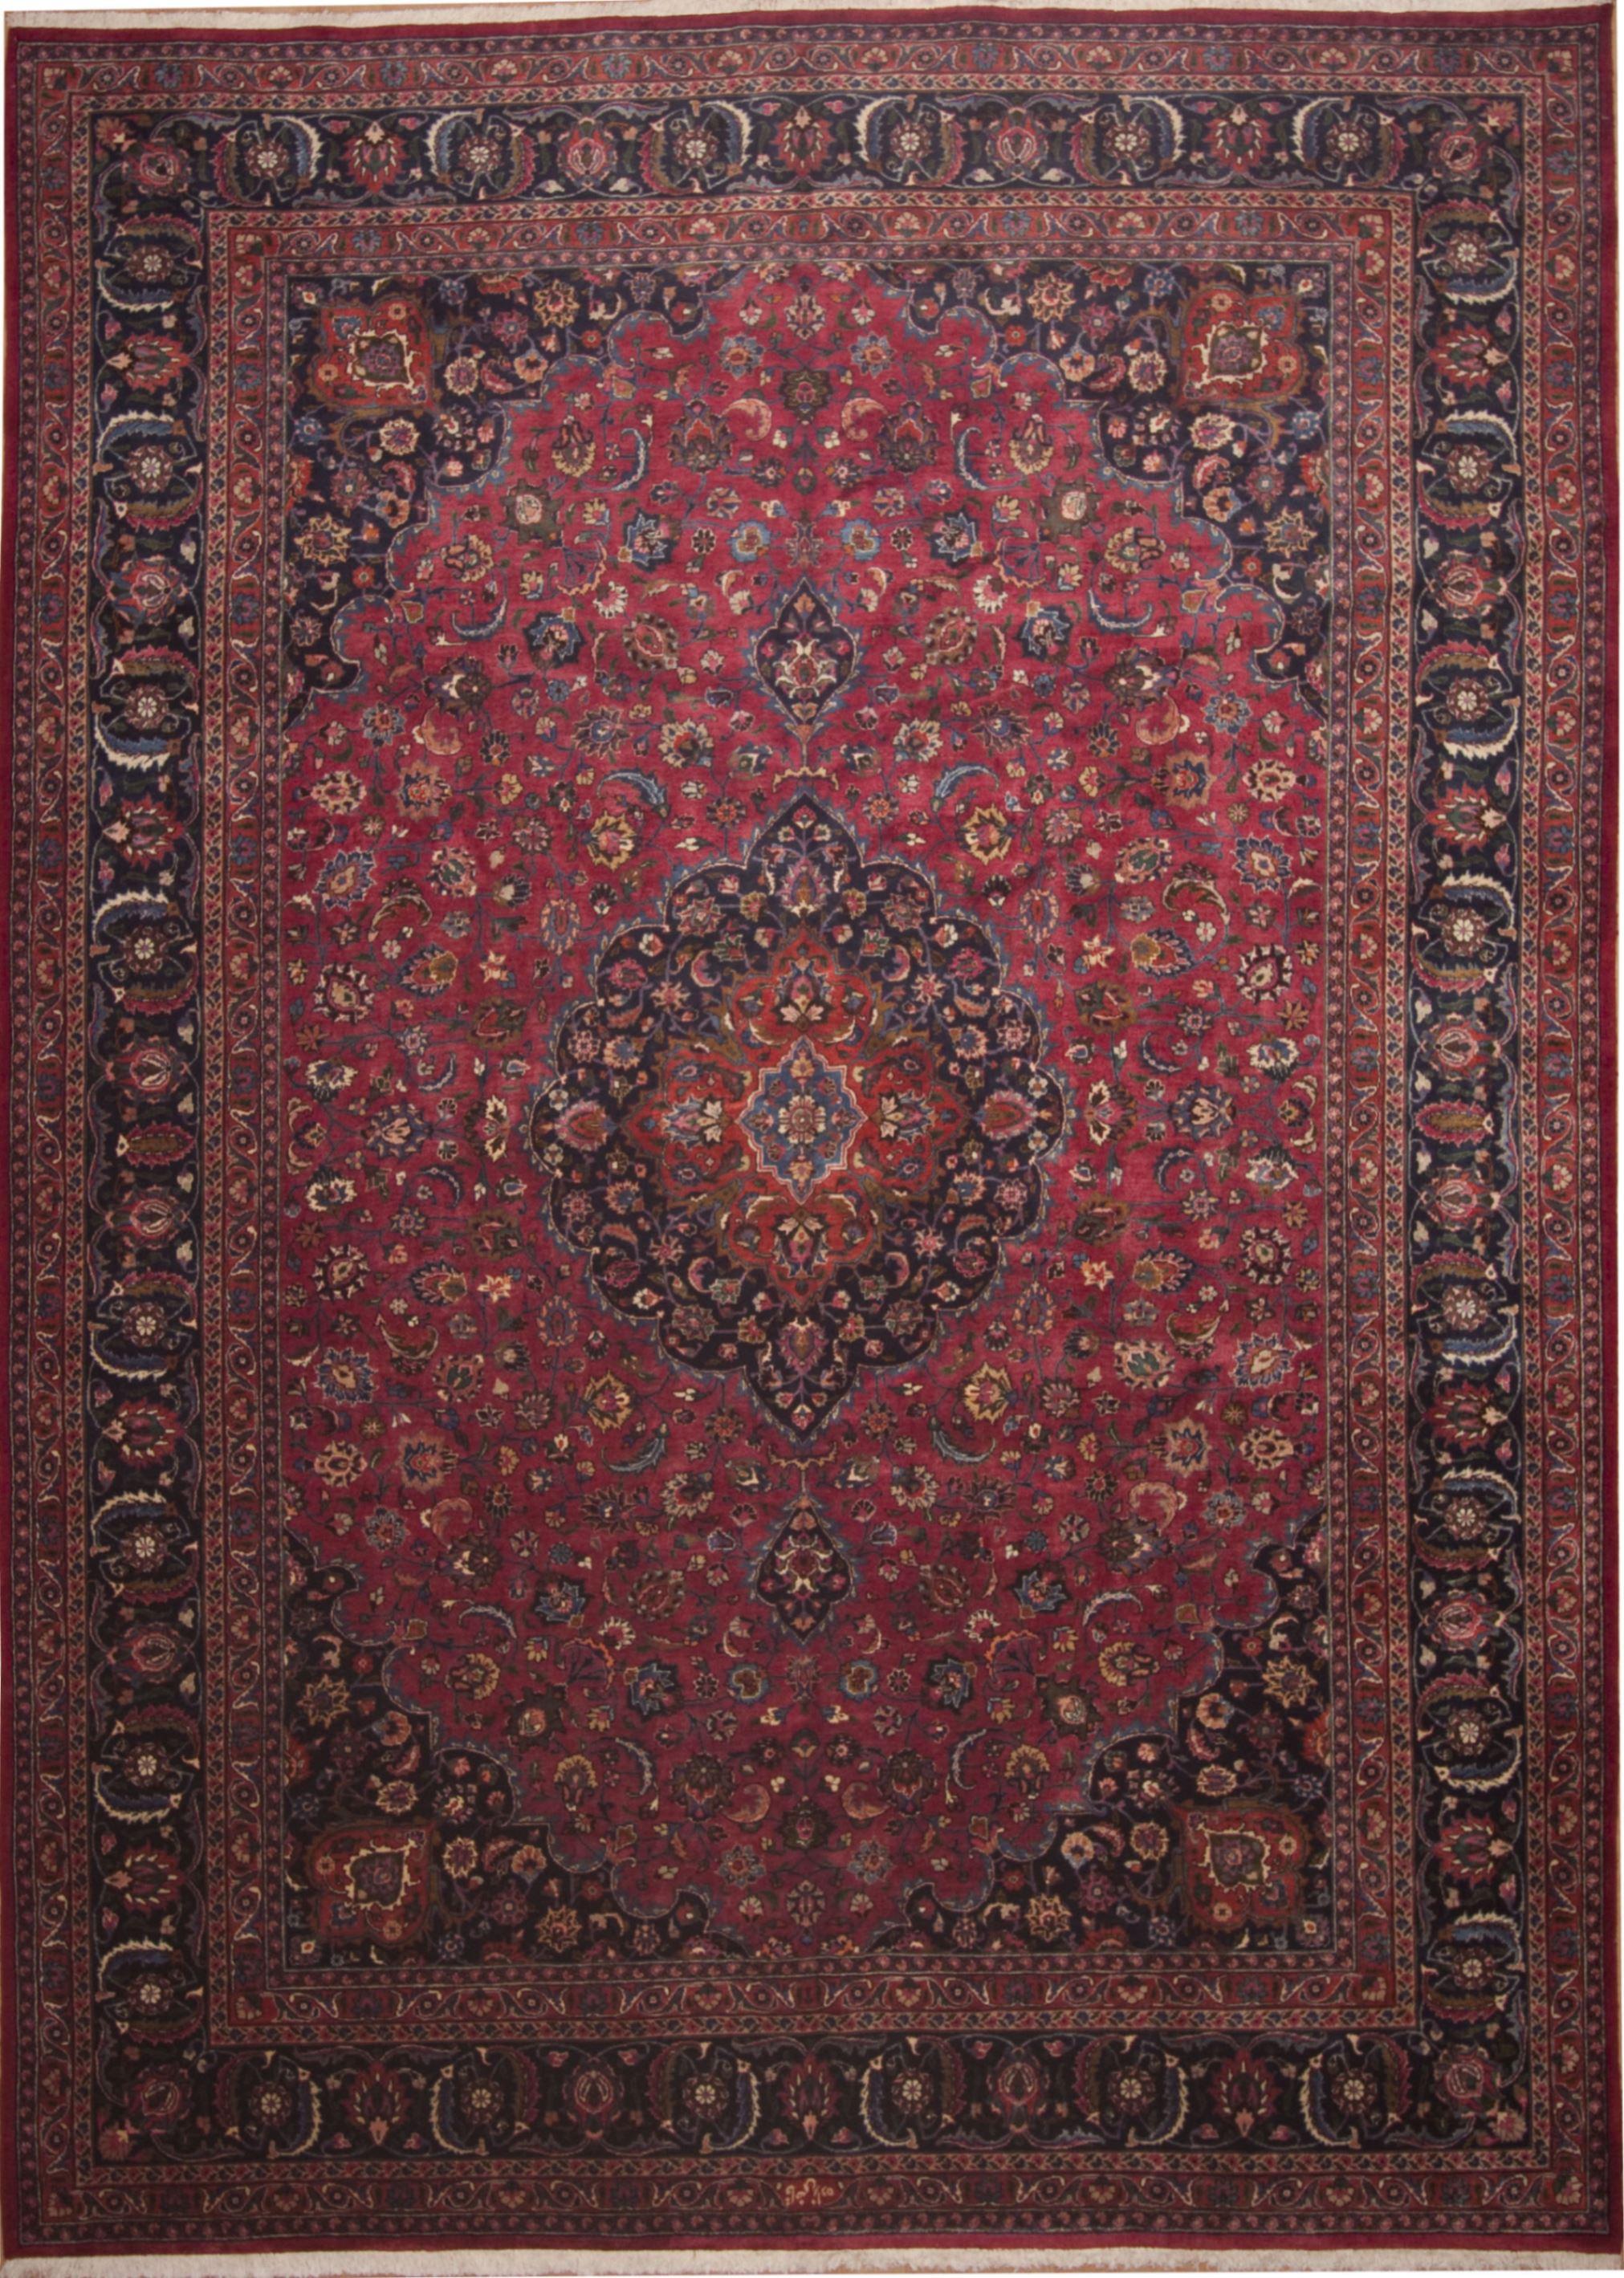 Persian Mashad Red Rectangle 11x16 Ft Wool Carpet 11258 Mashad